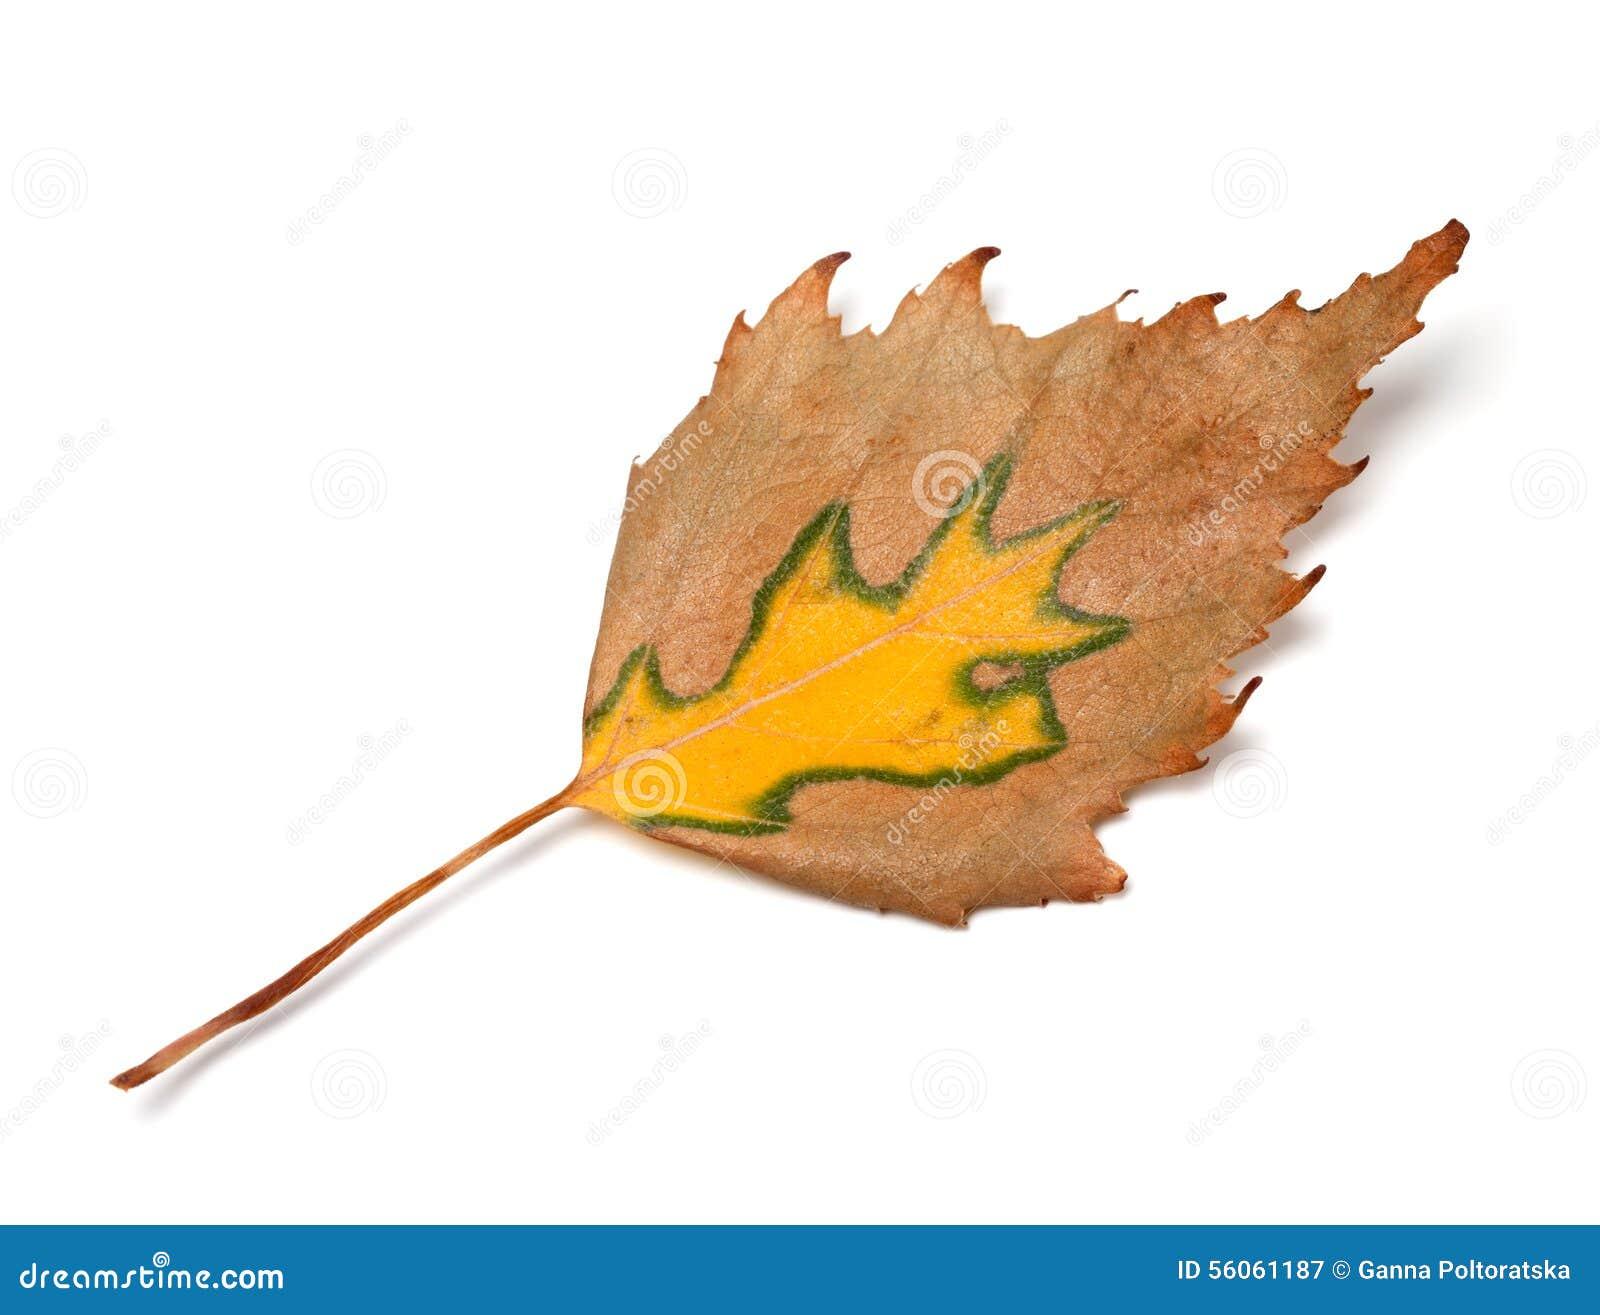 Feuille de bouleau d 39 automne image stock image 56061187 - Feuille de bouleau photo ...